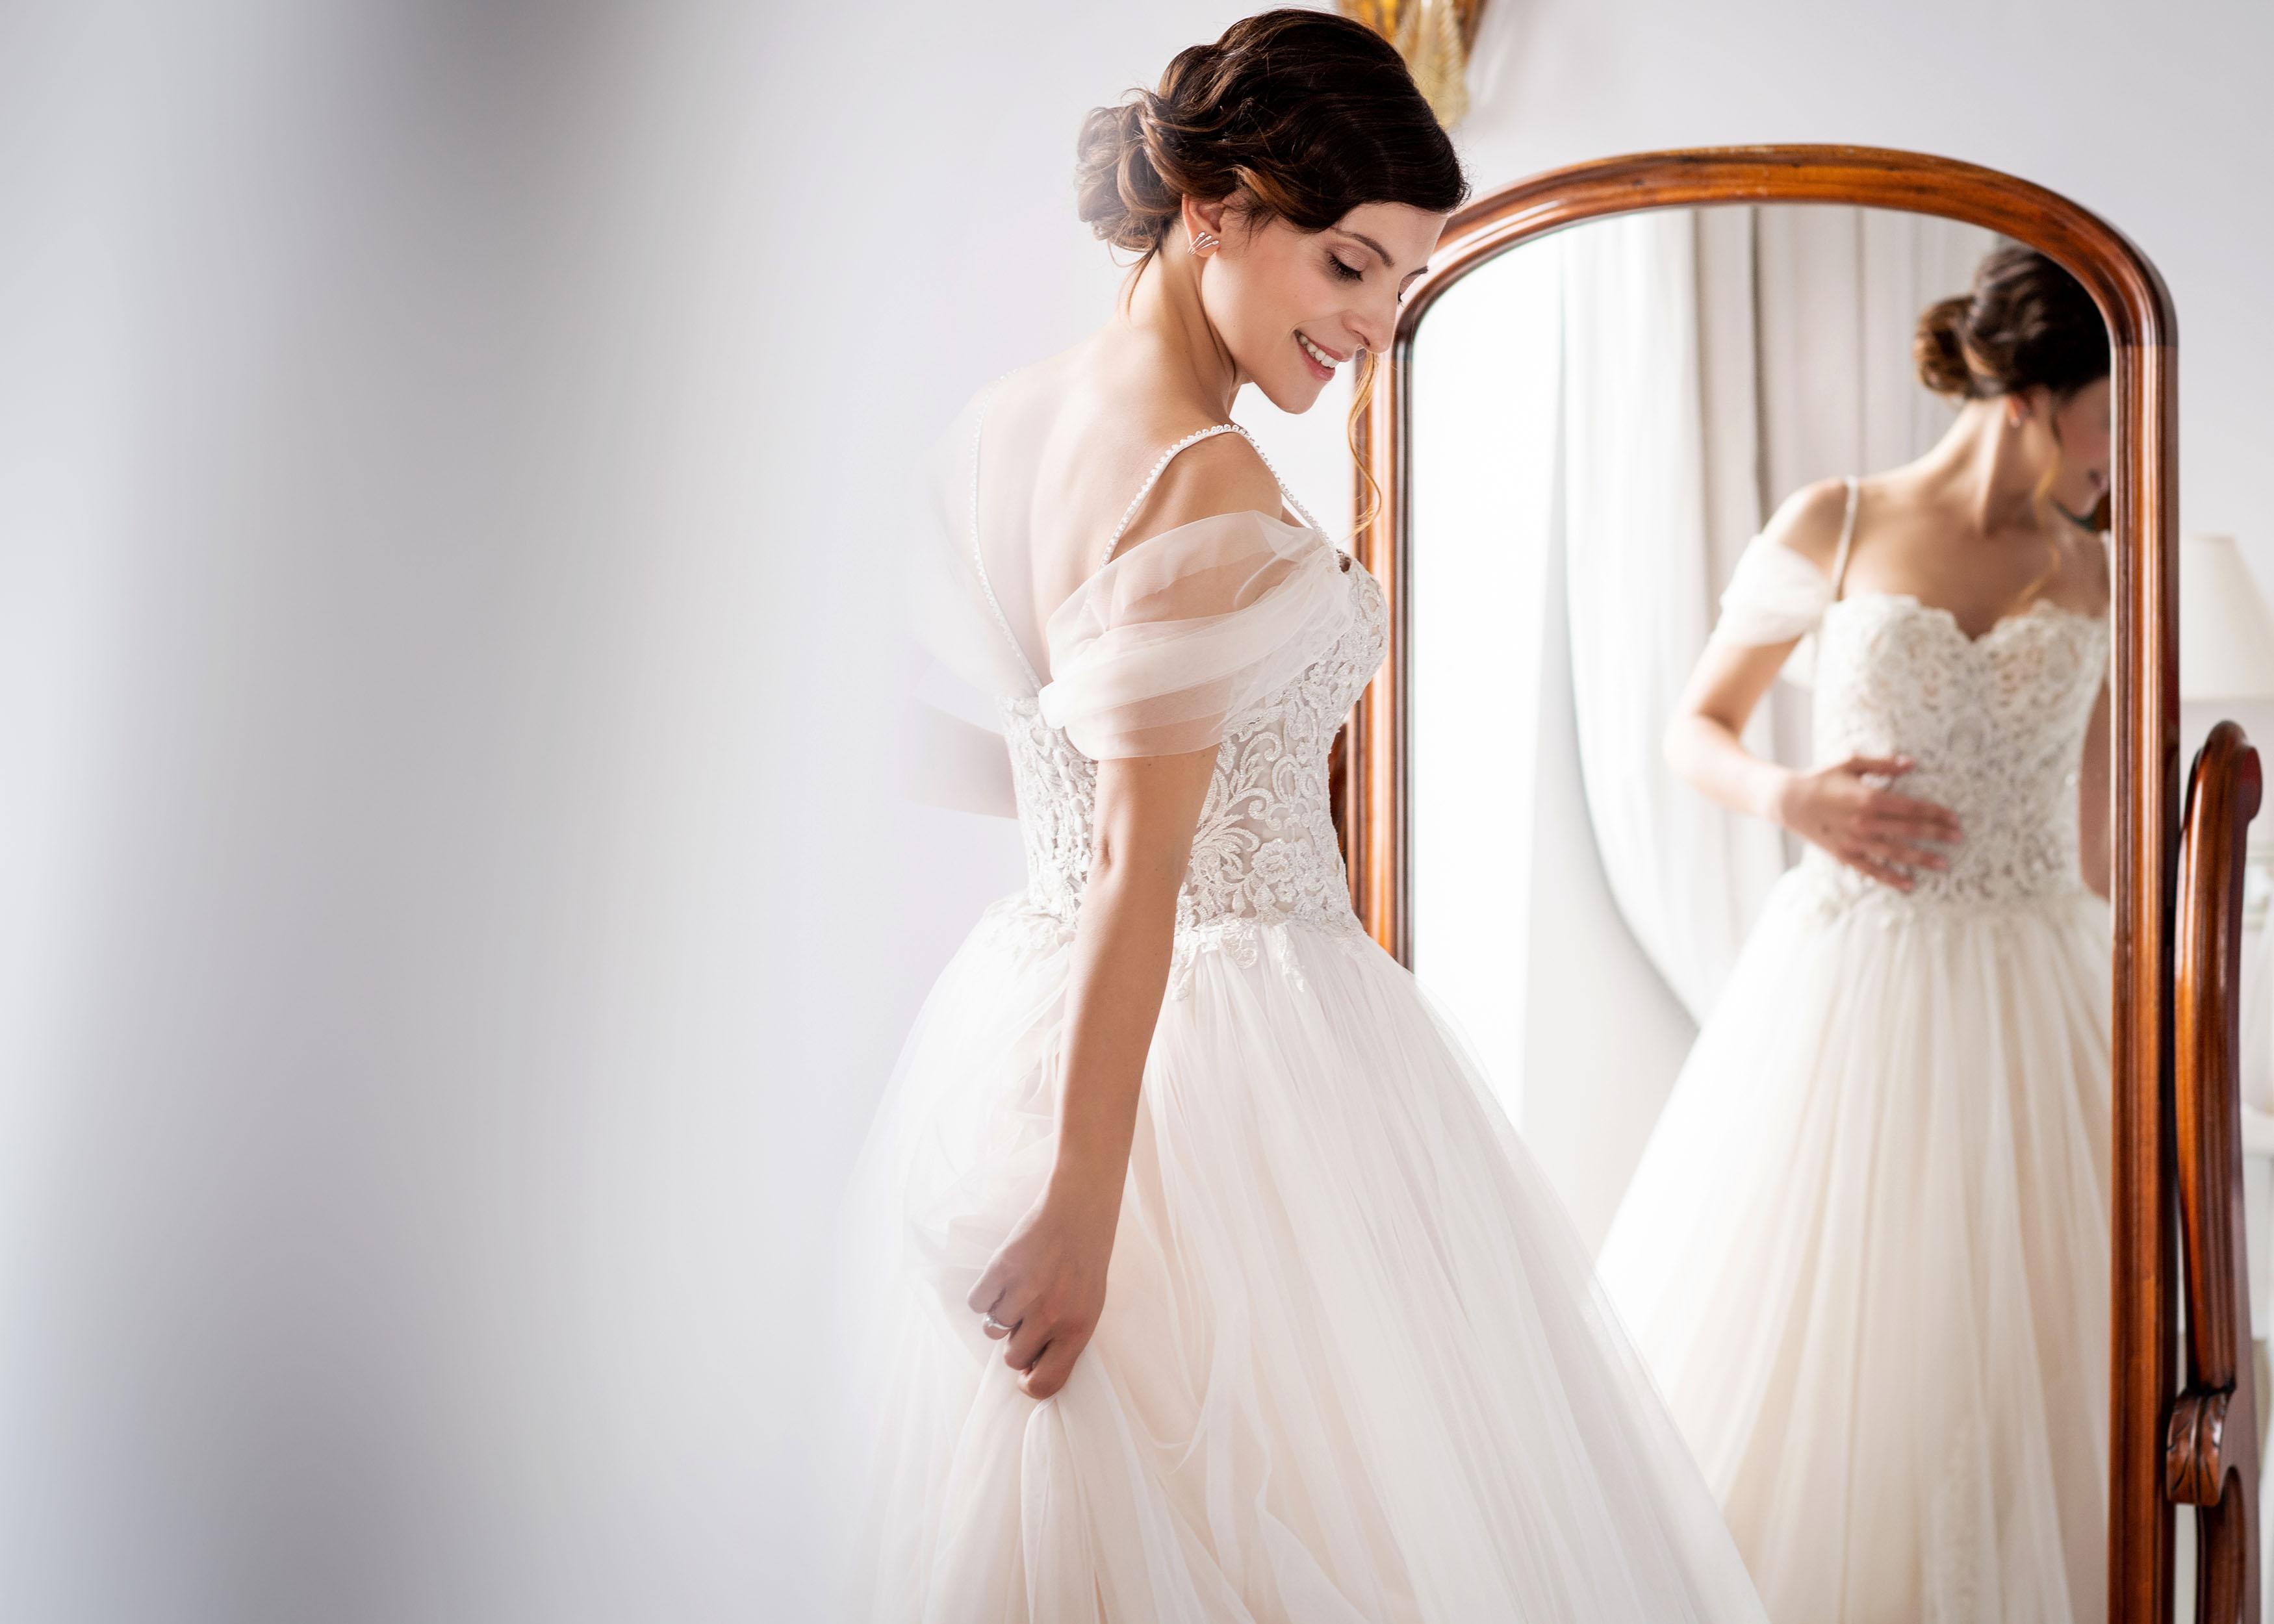 https://www.weddingamalfi.com/wp-content/uploads/Katia-Jorge-18-maggio-2019-15.jpg